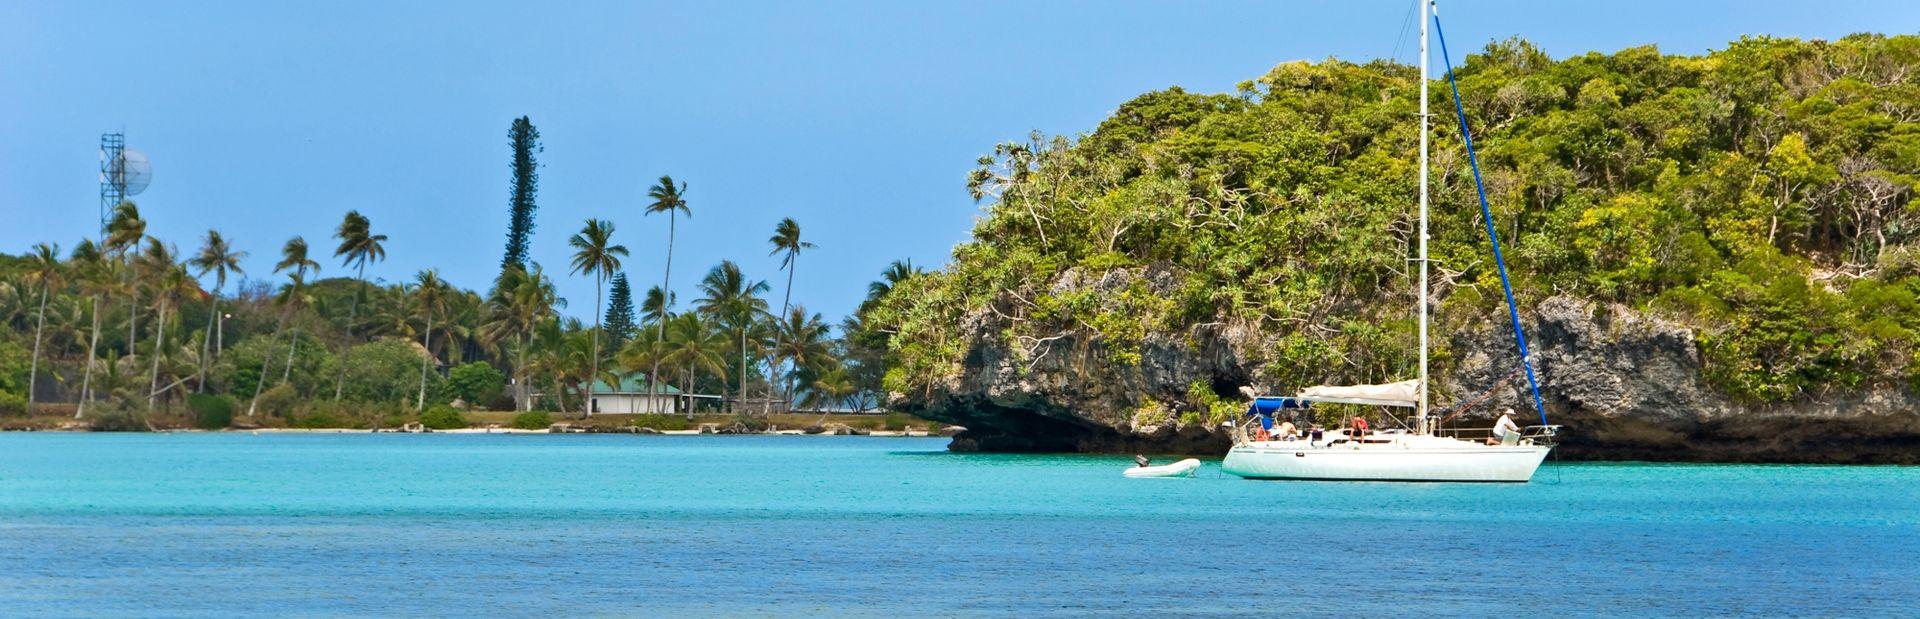 New Caledonia climate photo